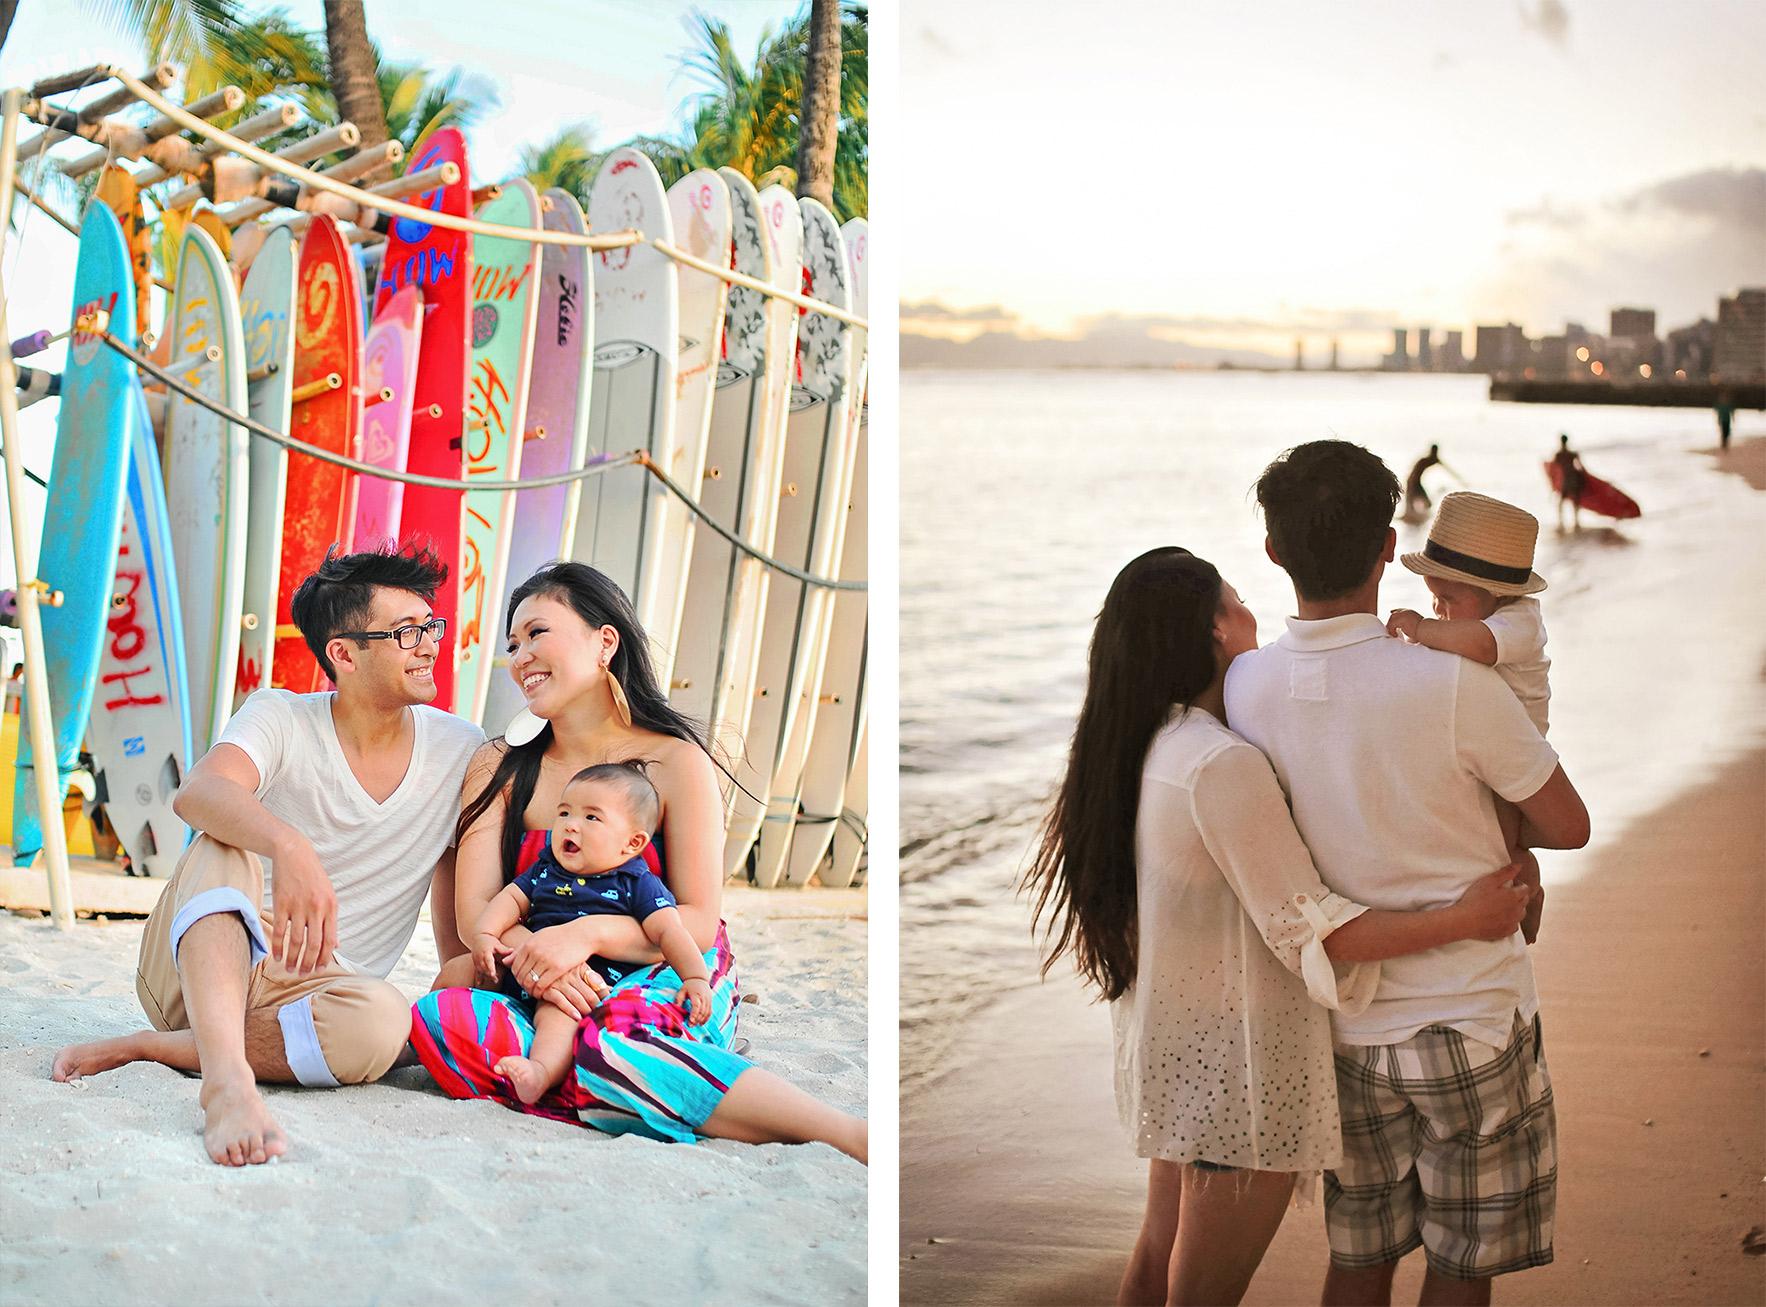 family-photo-oahu-hawaii-waikiki-beach-8-stephen-ludwig.jpg